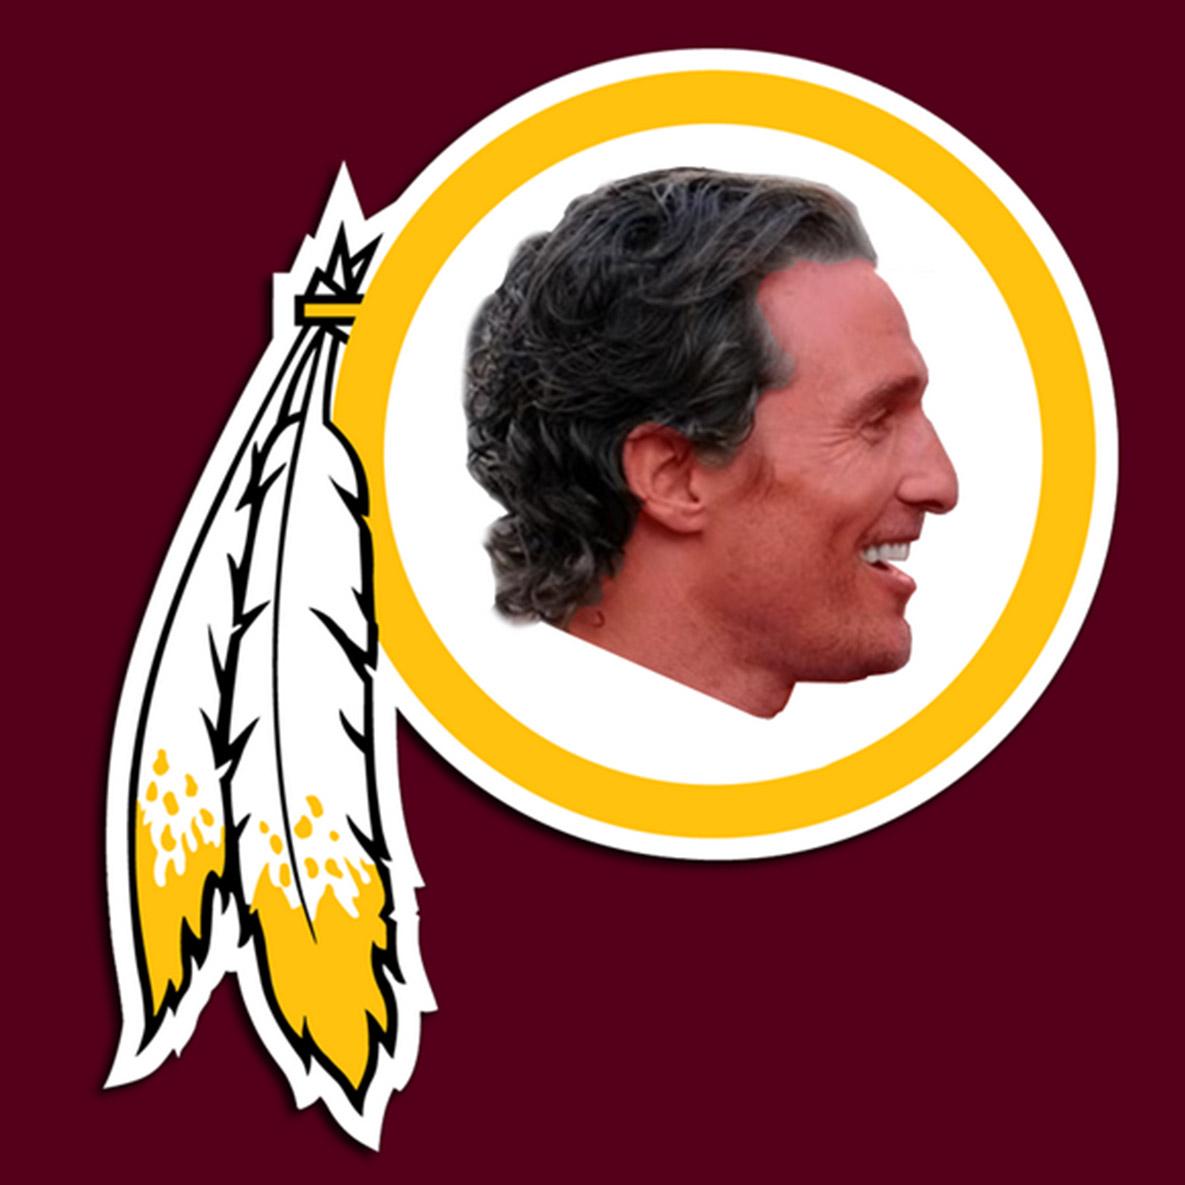 Matthew McConaughey as new Redskins logo